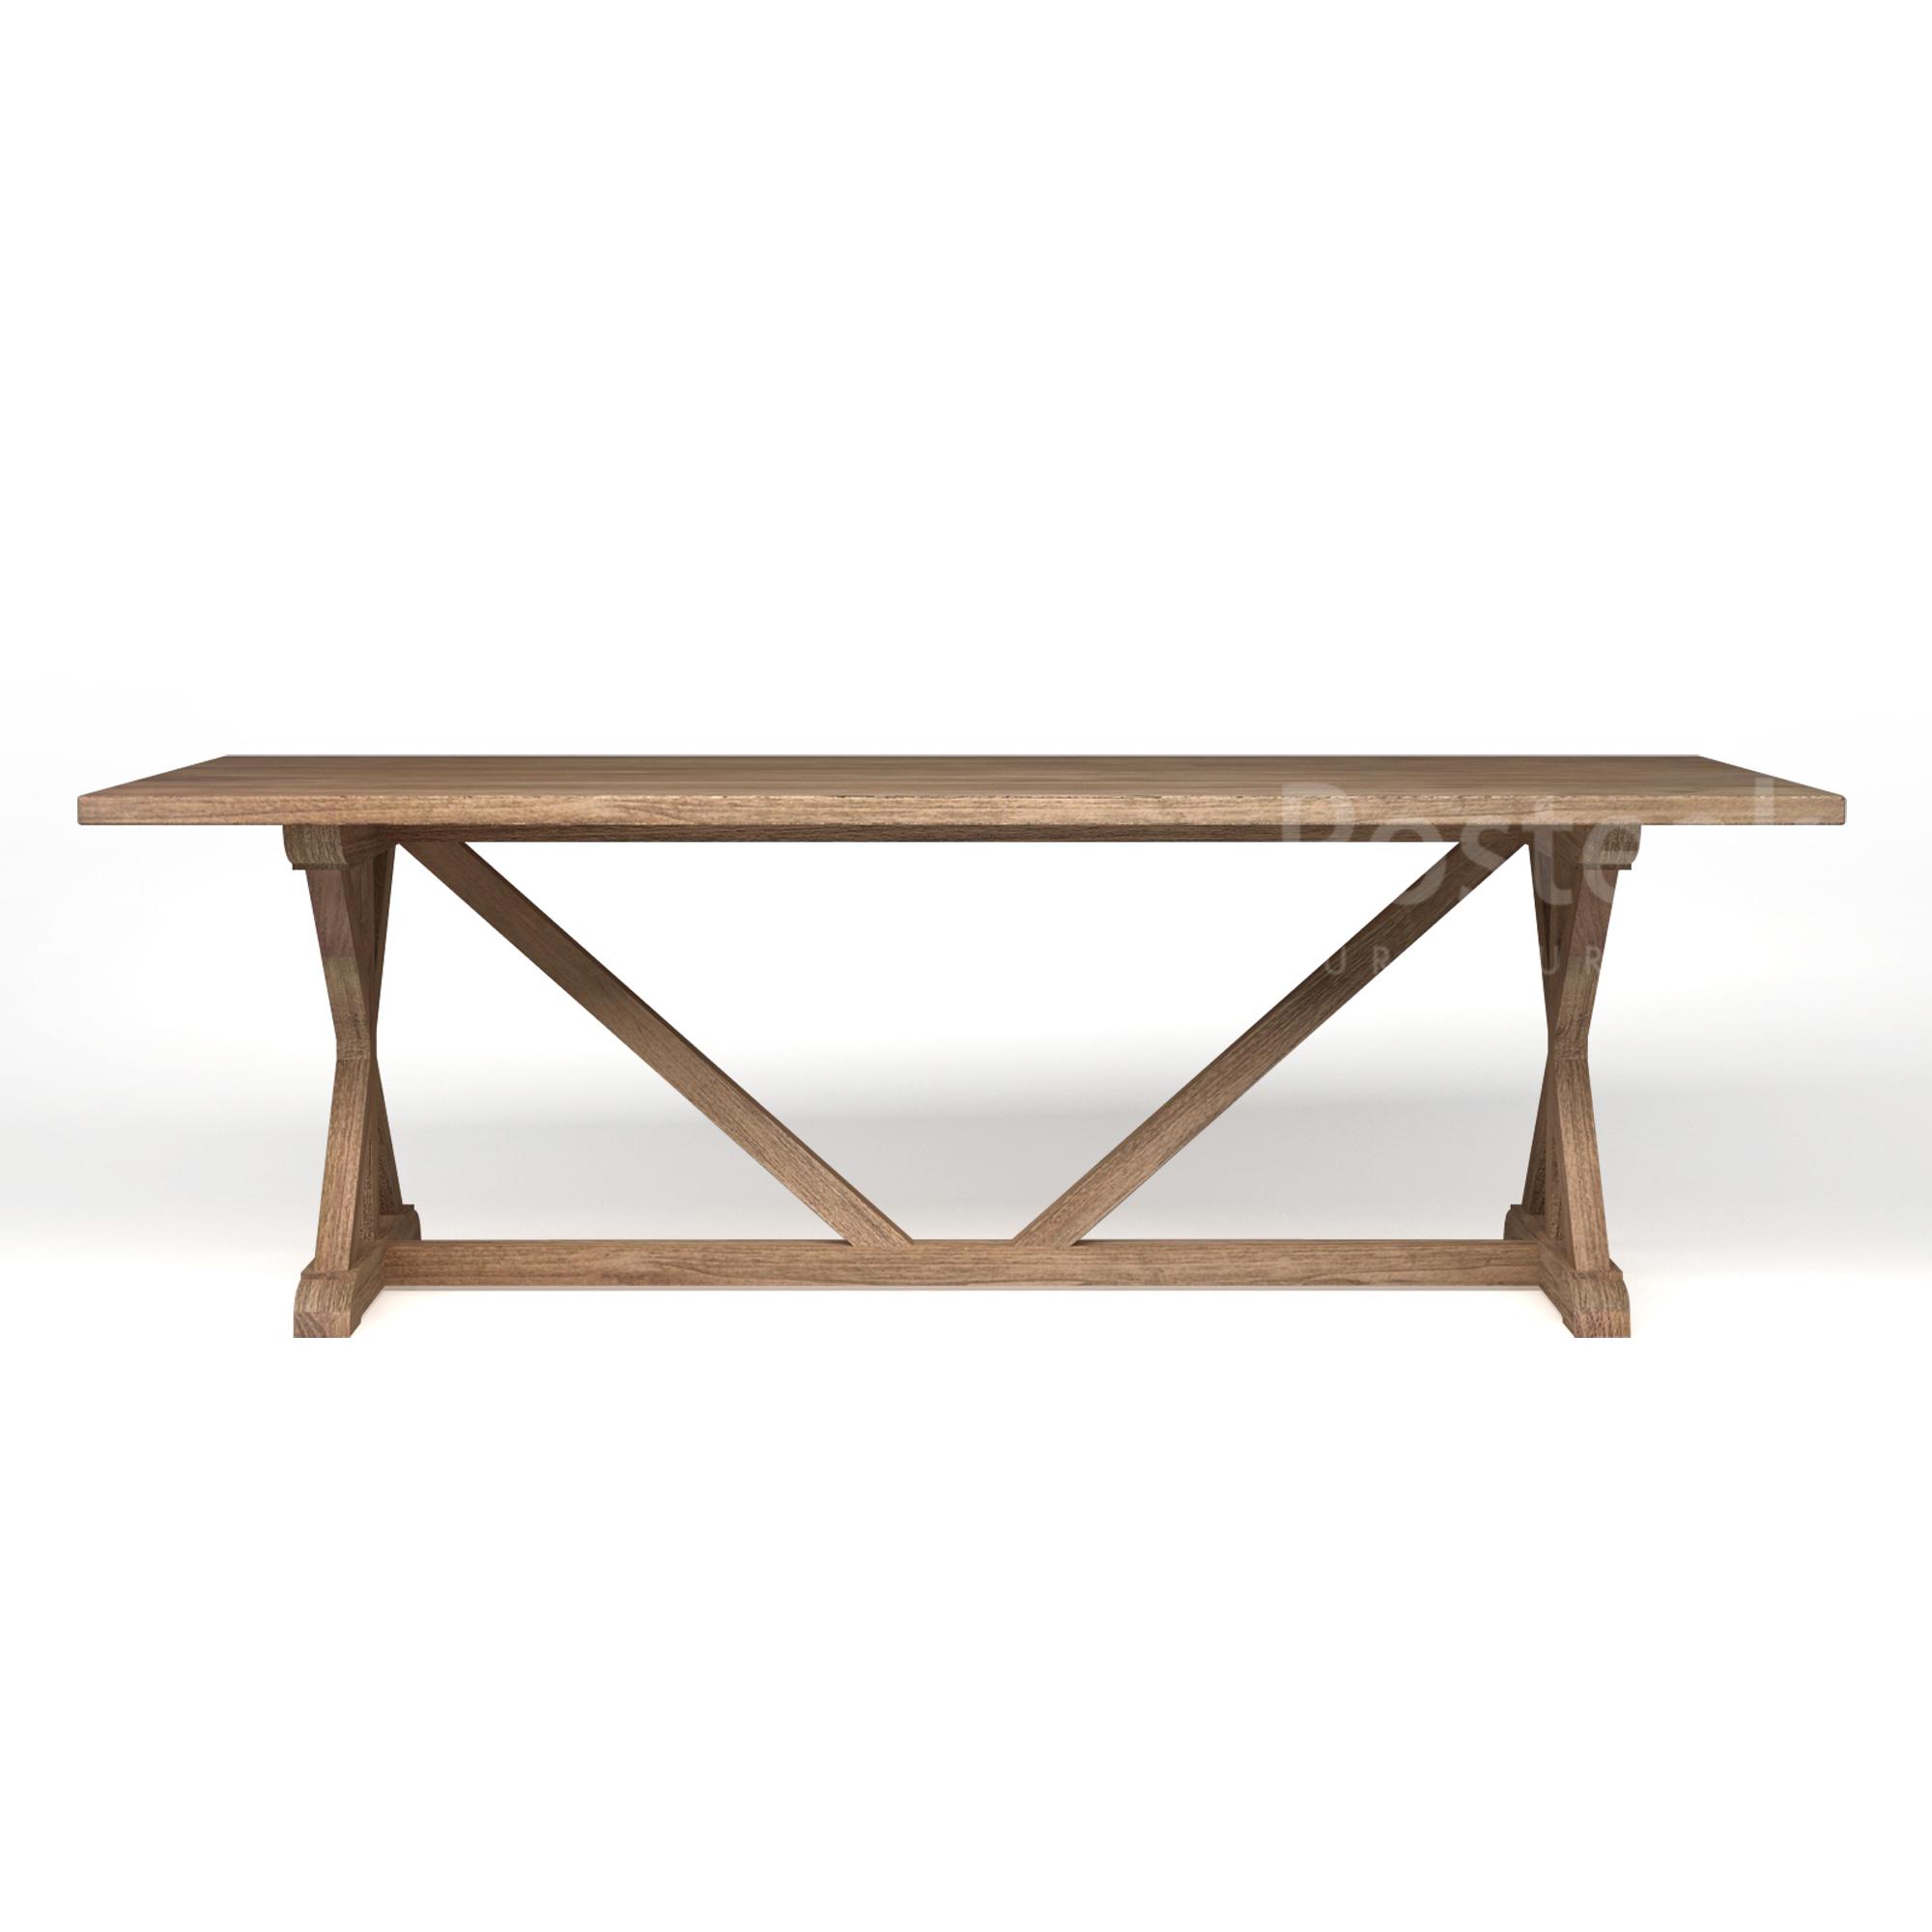 Superb Classic Dining Table Farmhouse Cross Legs Posteak Furniture Uwap Interior Chair Design Uwaporg